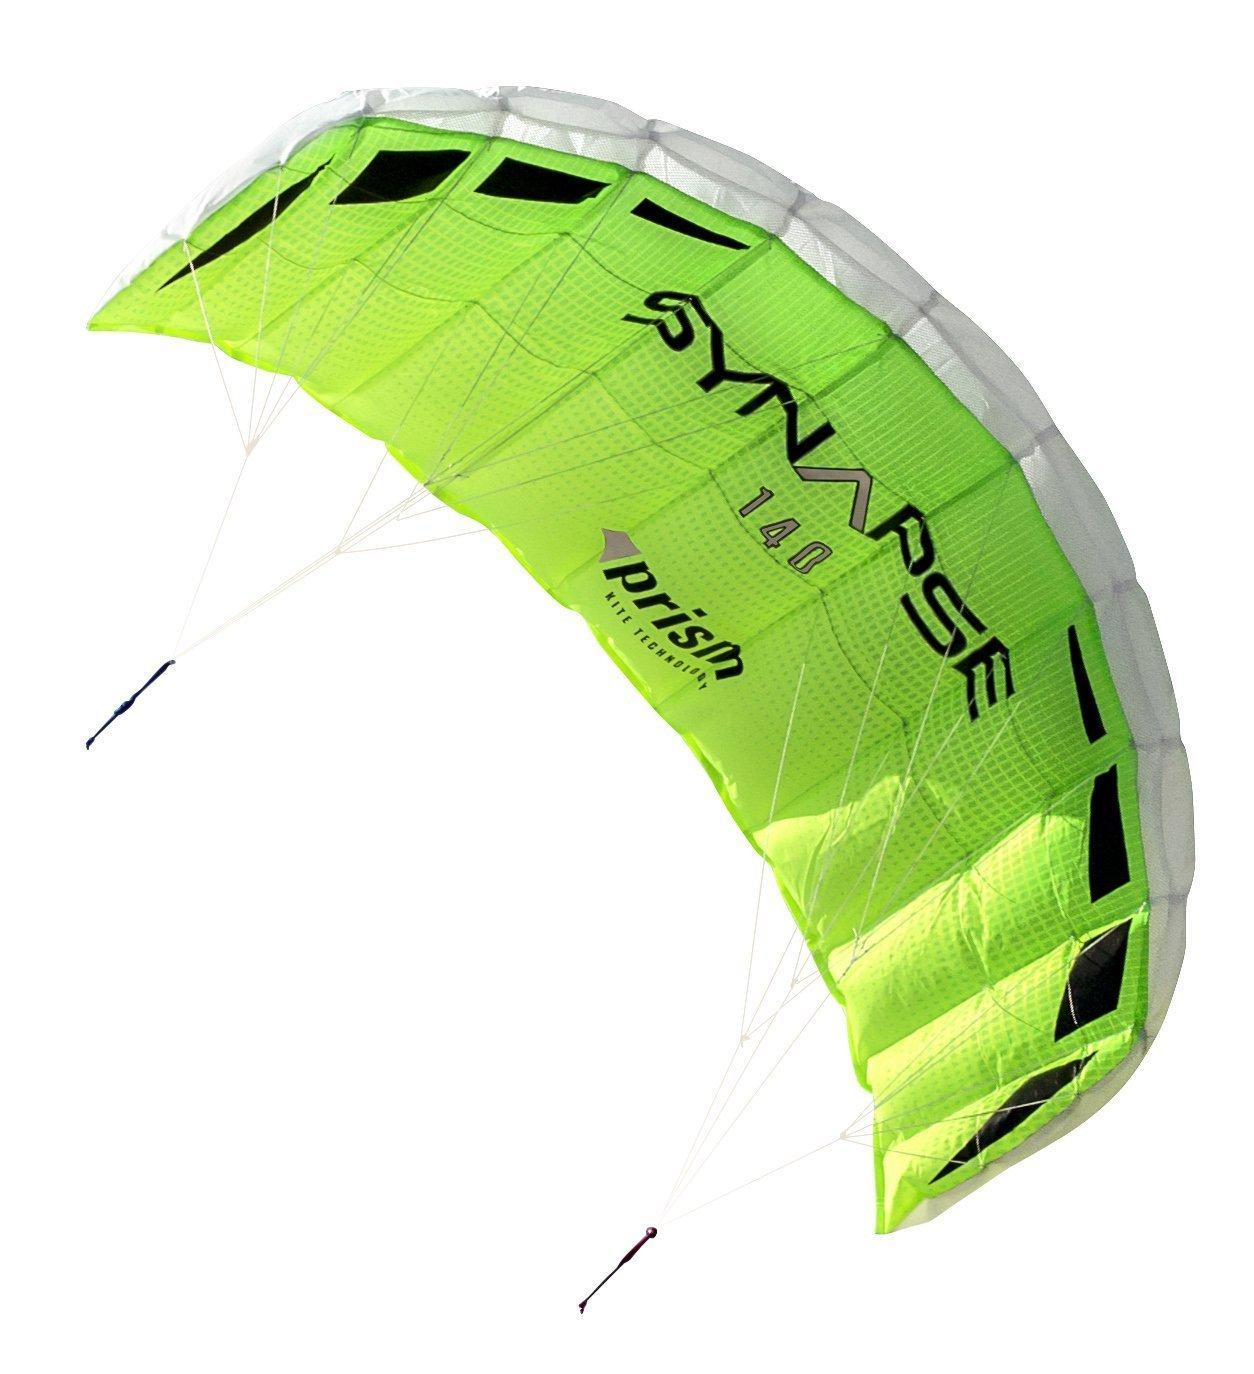 Prism Synapse Dual-line Parafoil Kite, 140 by Prism Kite Technology